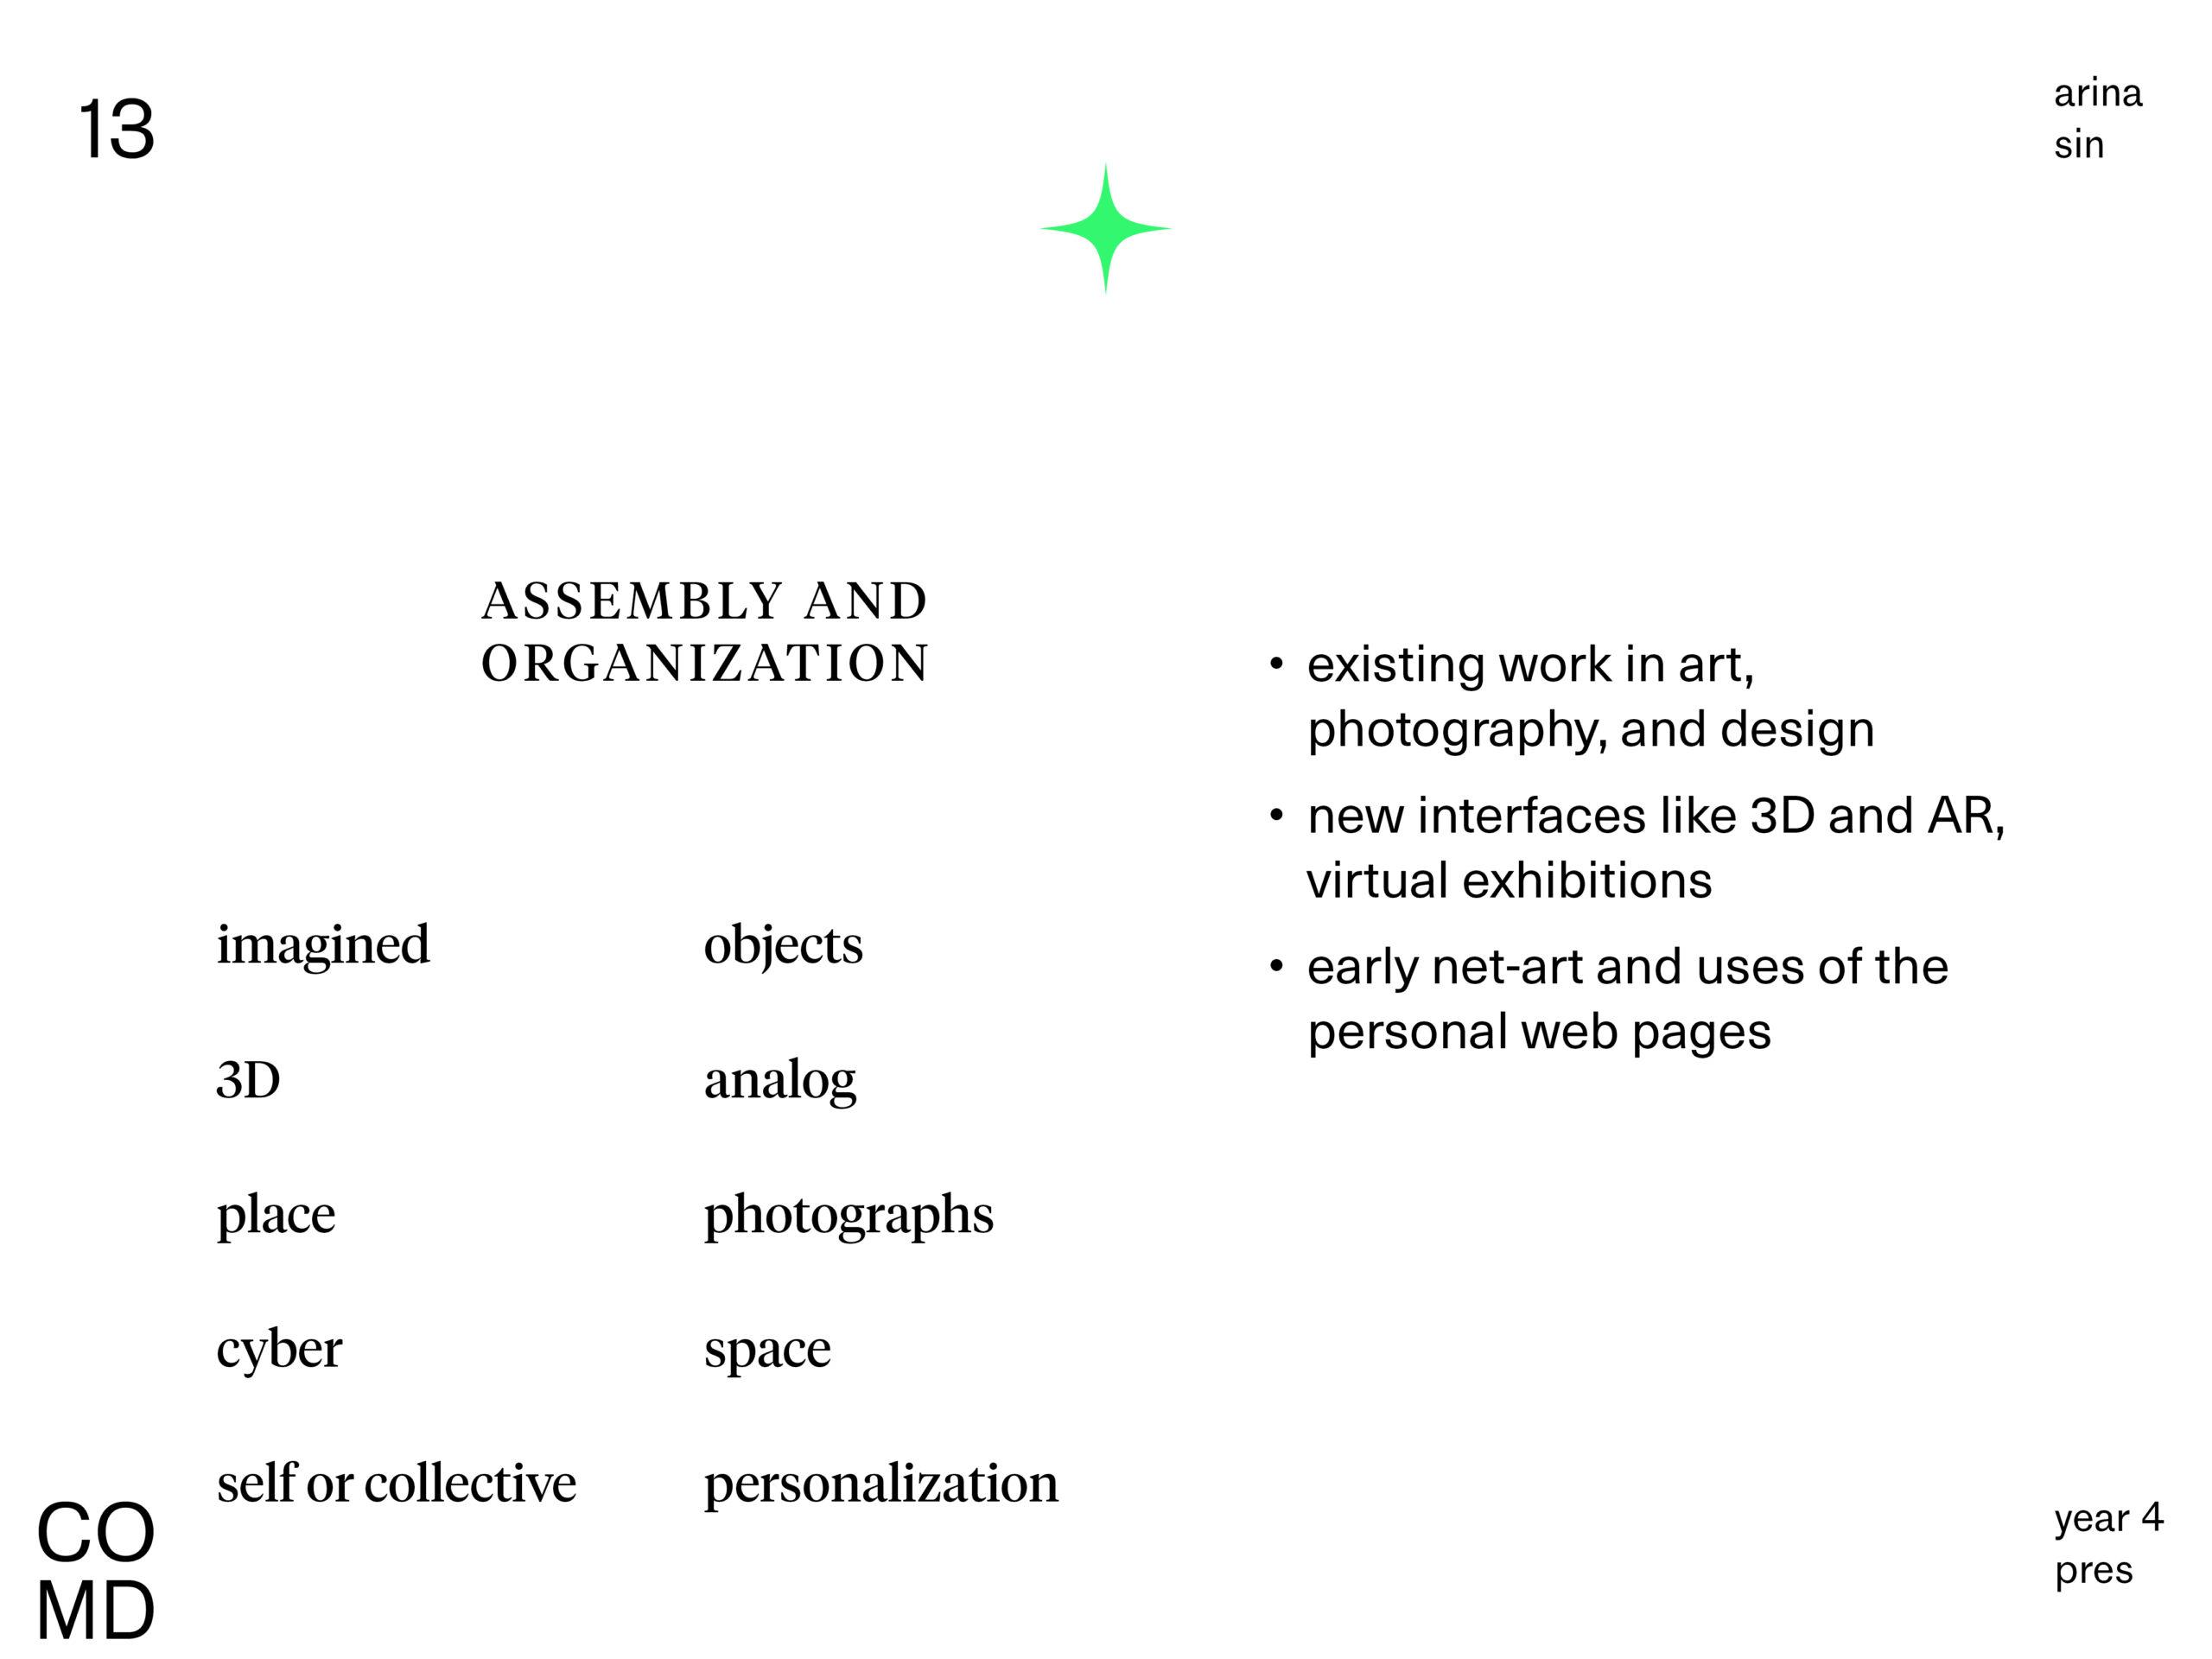 presentation_ArinaSin13